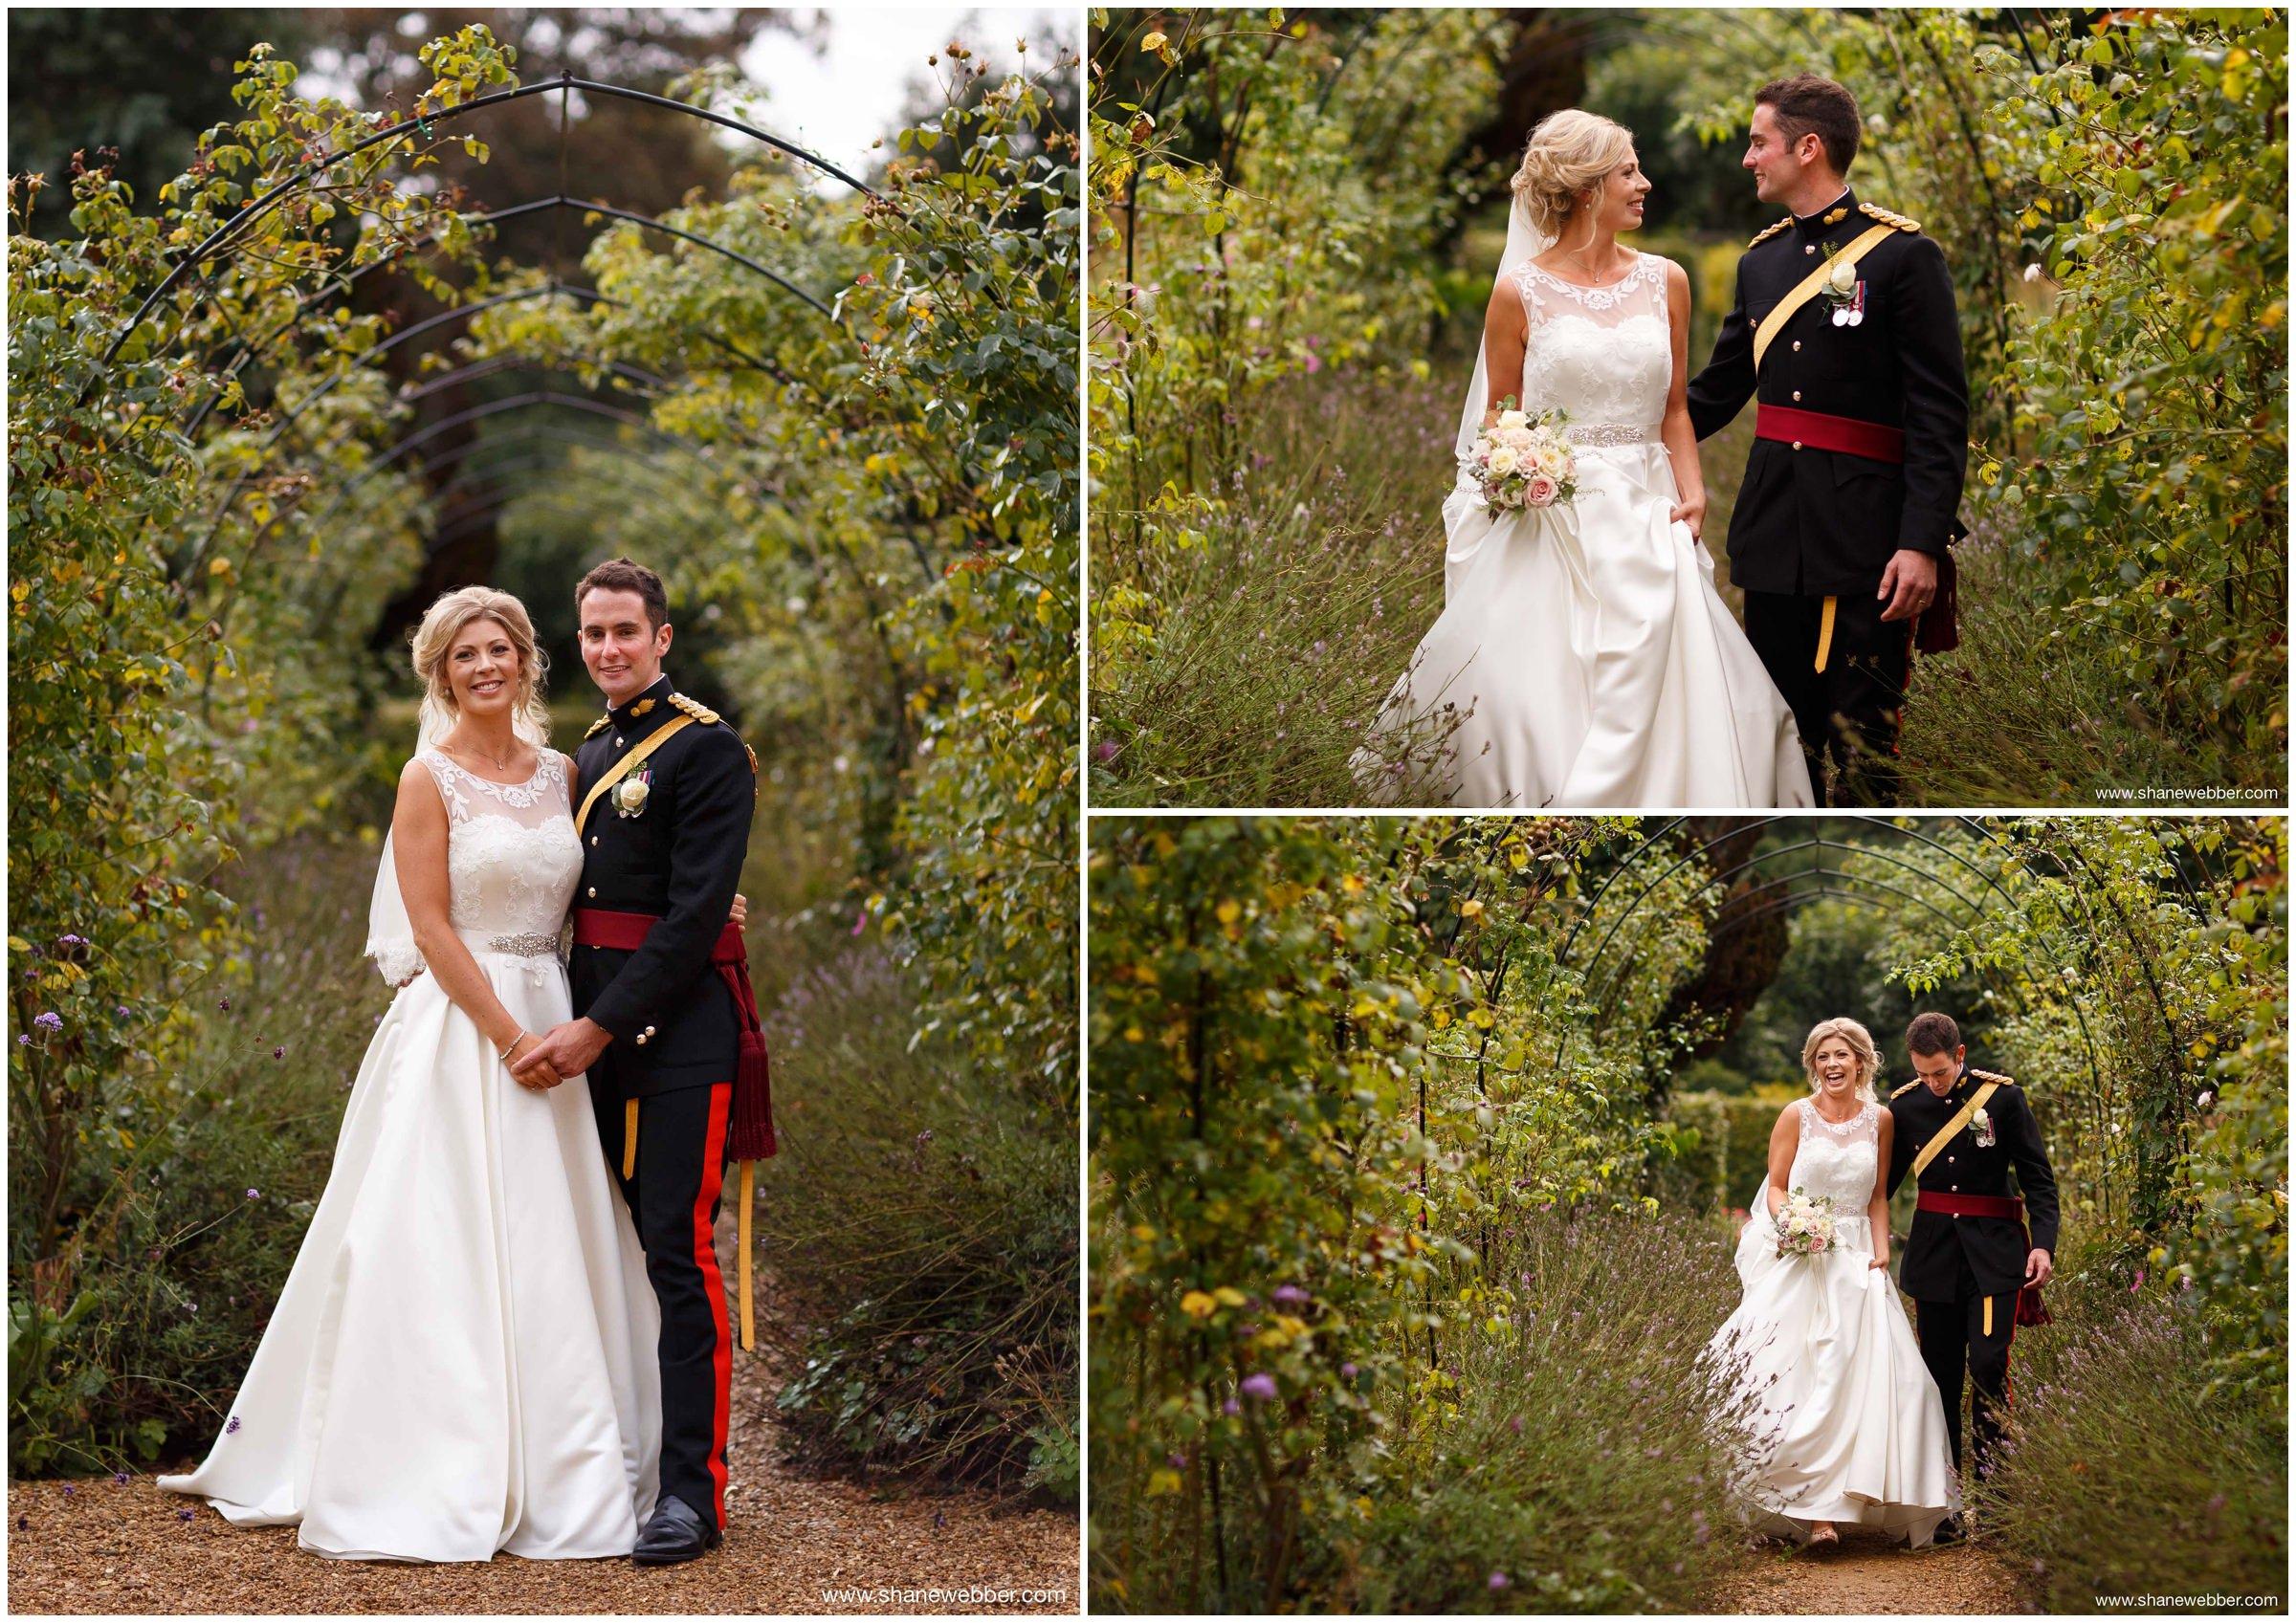 William Cecil weddings